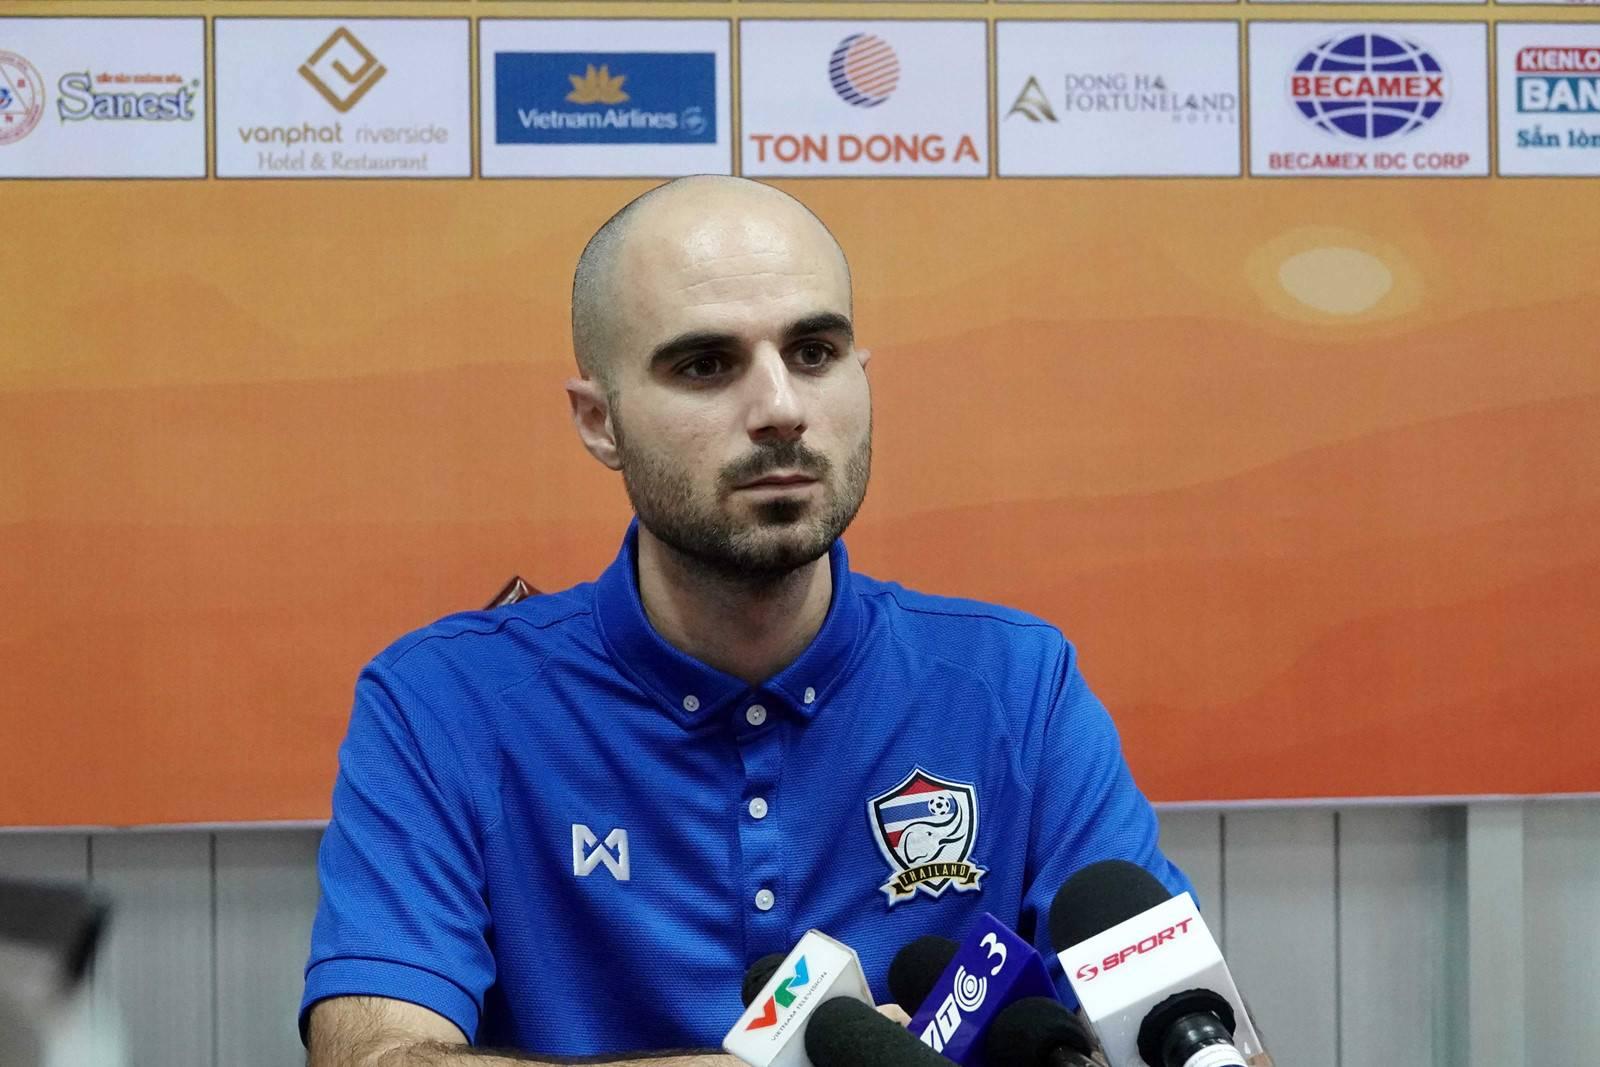 Thailand U21 head coach: Bad results do not mean Thailand lag behind Vietnam